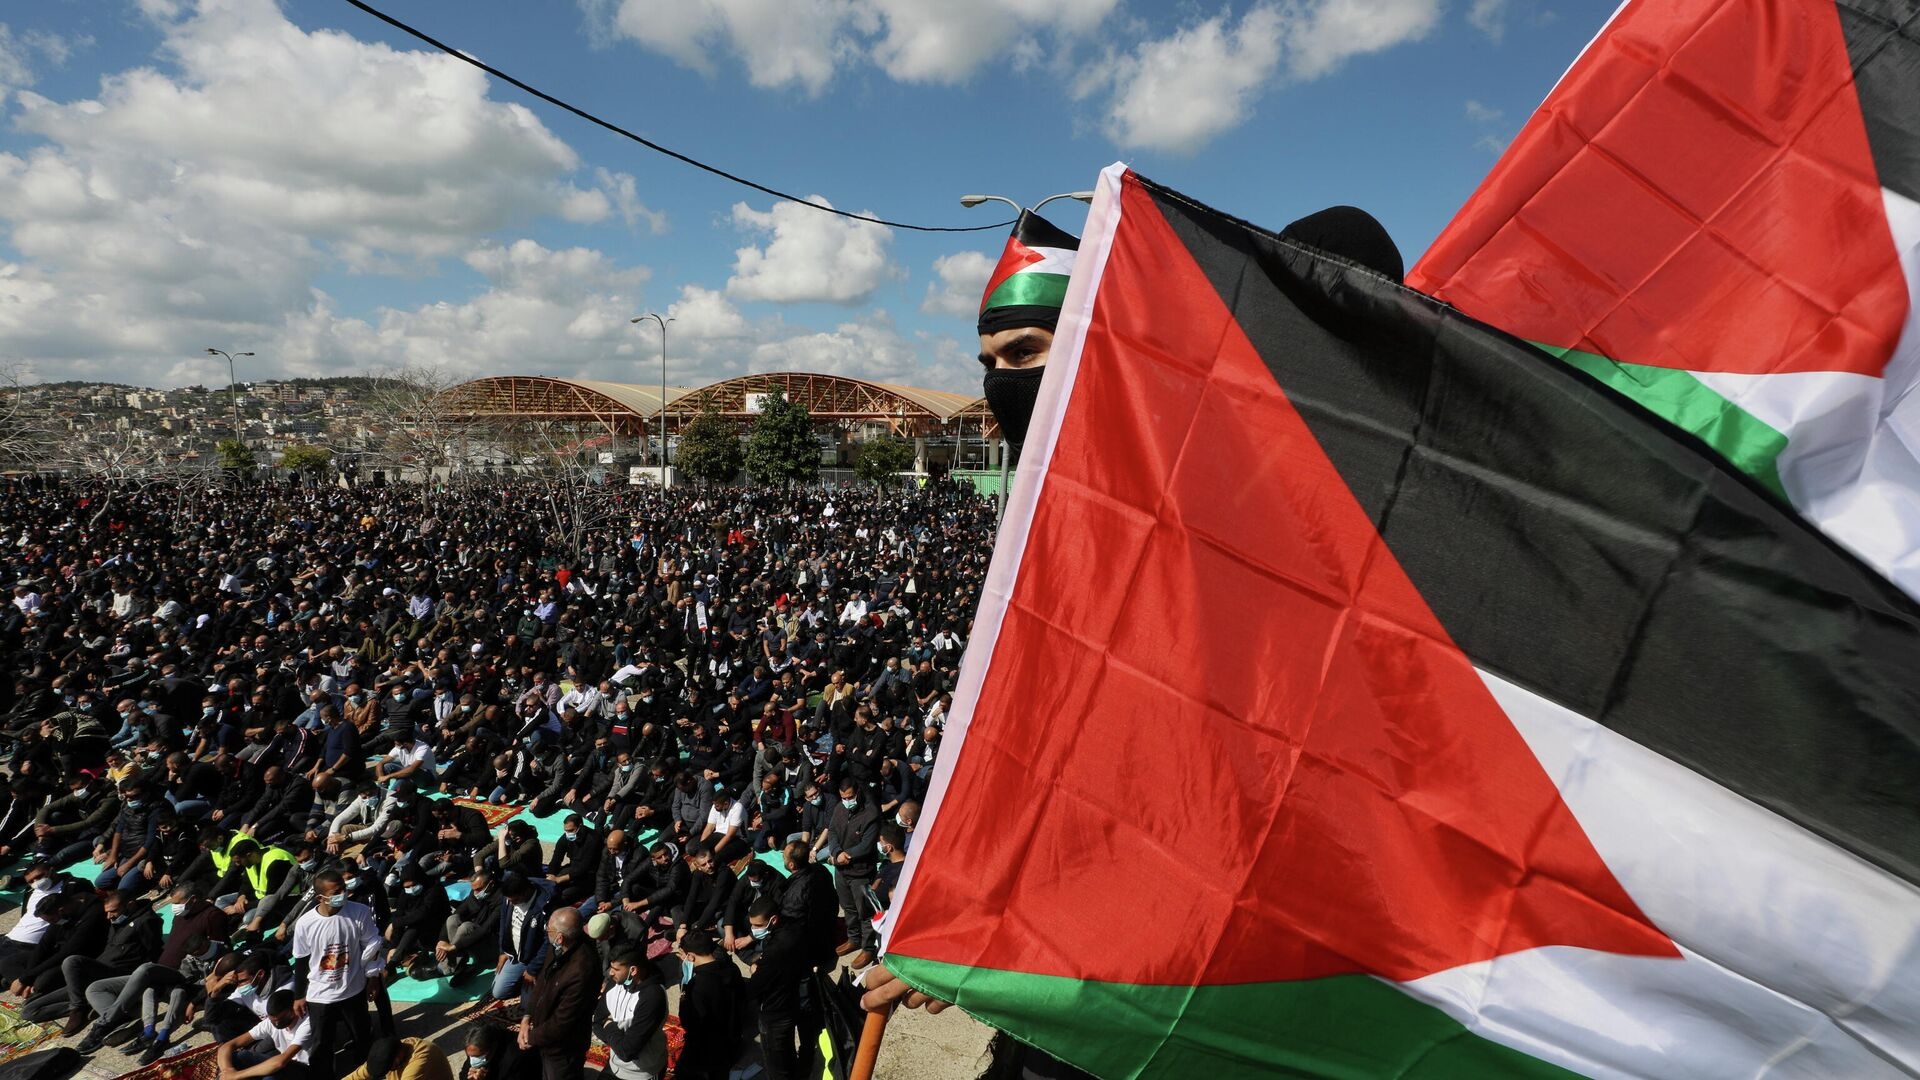 Árabes israelíes protestan contra violencia policial en Israel - Sputnik Mundo, 1920, 10.03.2021